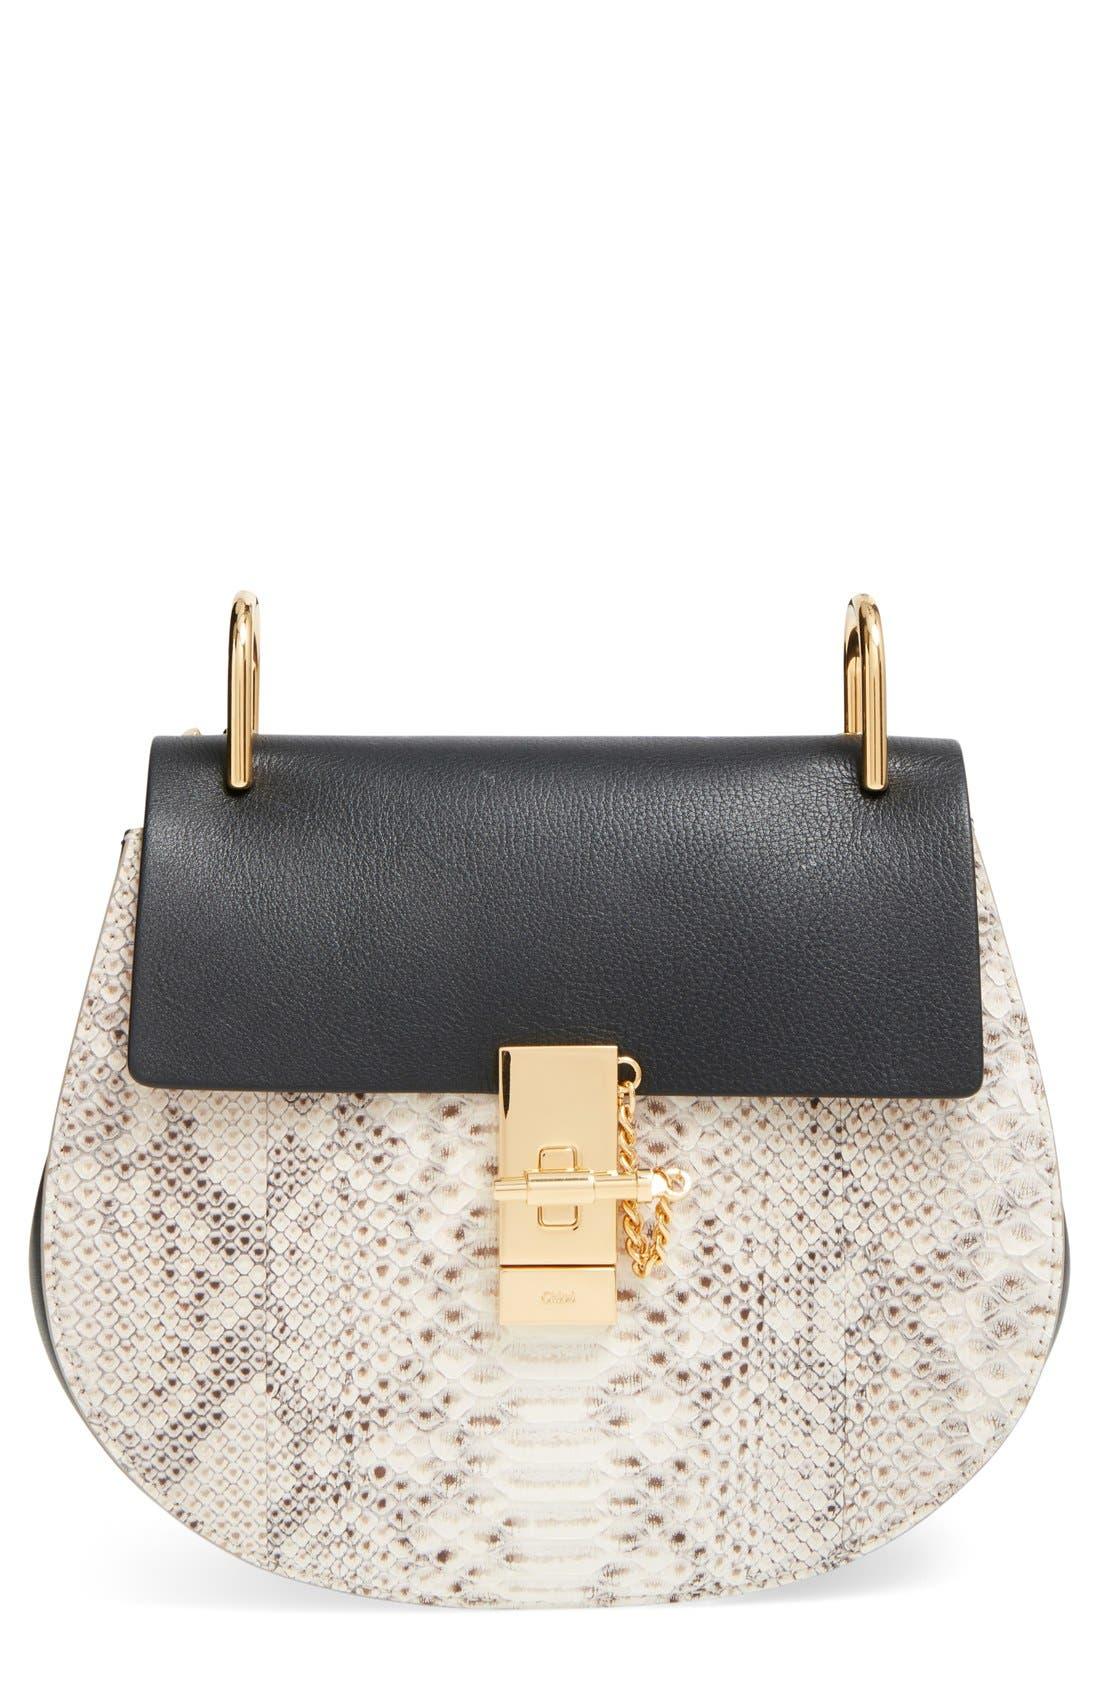 Main Image - Chloé'Small Drew' Genuine Python & Calfskin Leather Crossbody Bag